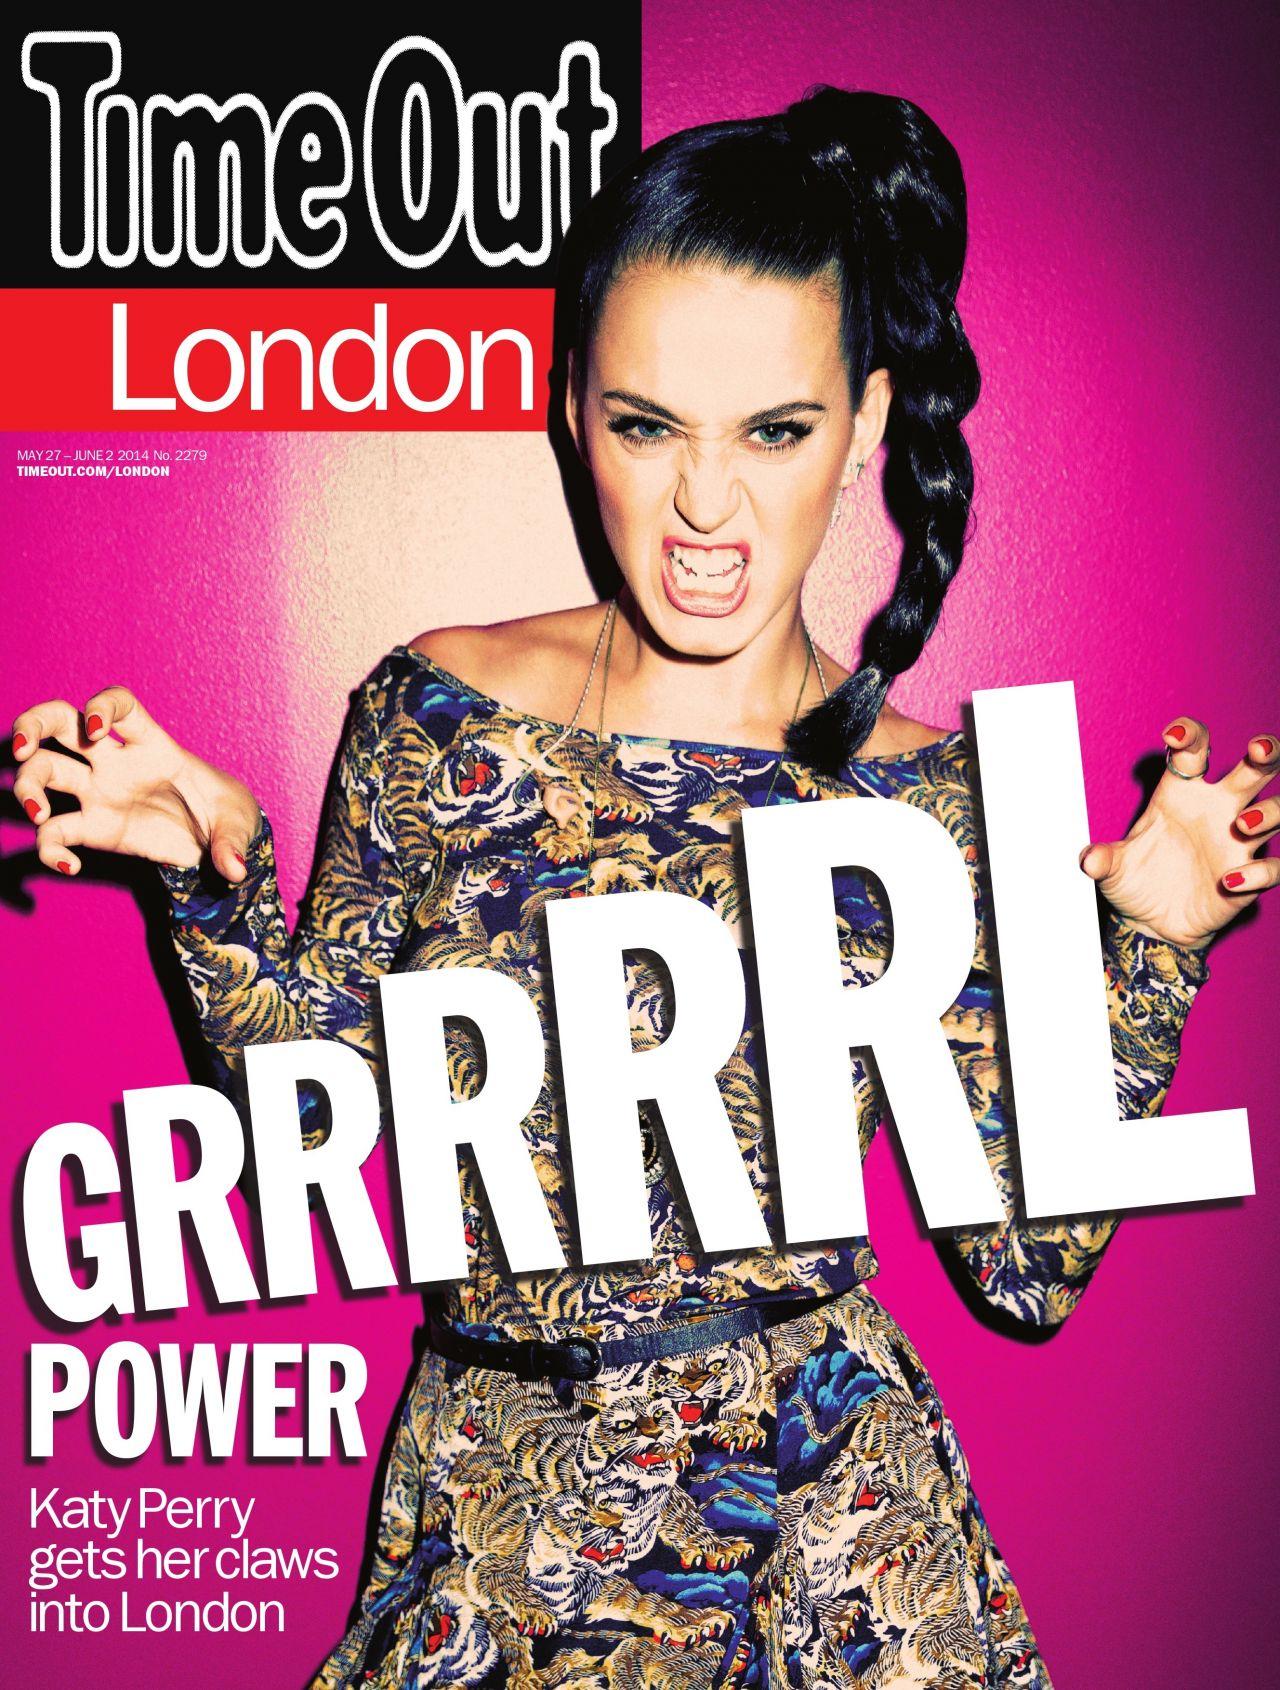 ��� ������� ��������� ���� ���� 2015 , ���� ��� ���� ���� 2015 Katy Perry